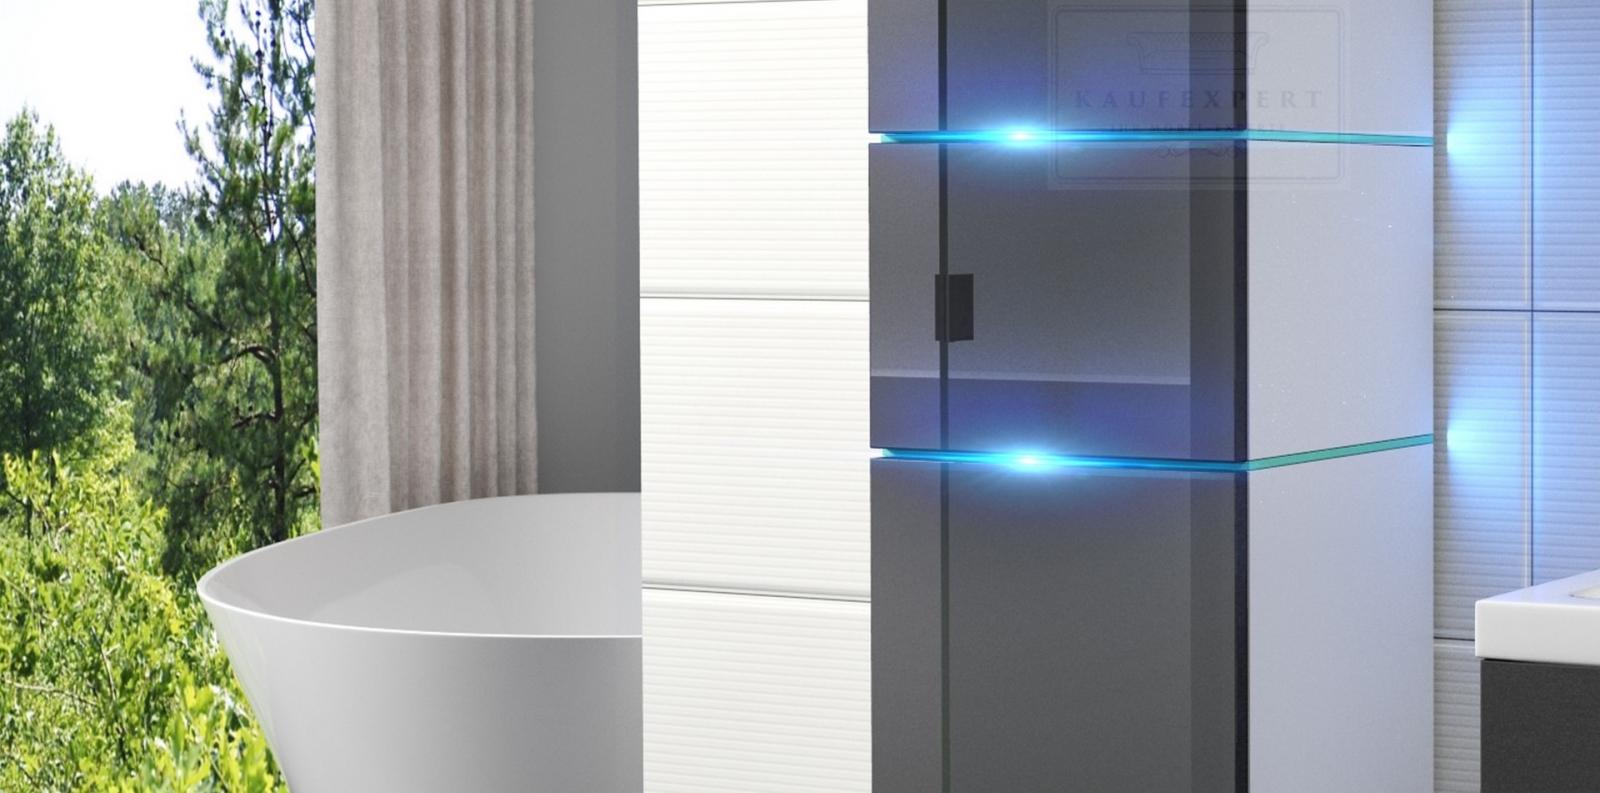 kaufexpert badm bel set ledox 170 cm grau hochglanz wei keramik waschbecken badezimmer led. Black Bedroom Furniture Sets. Home Design Ideas